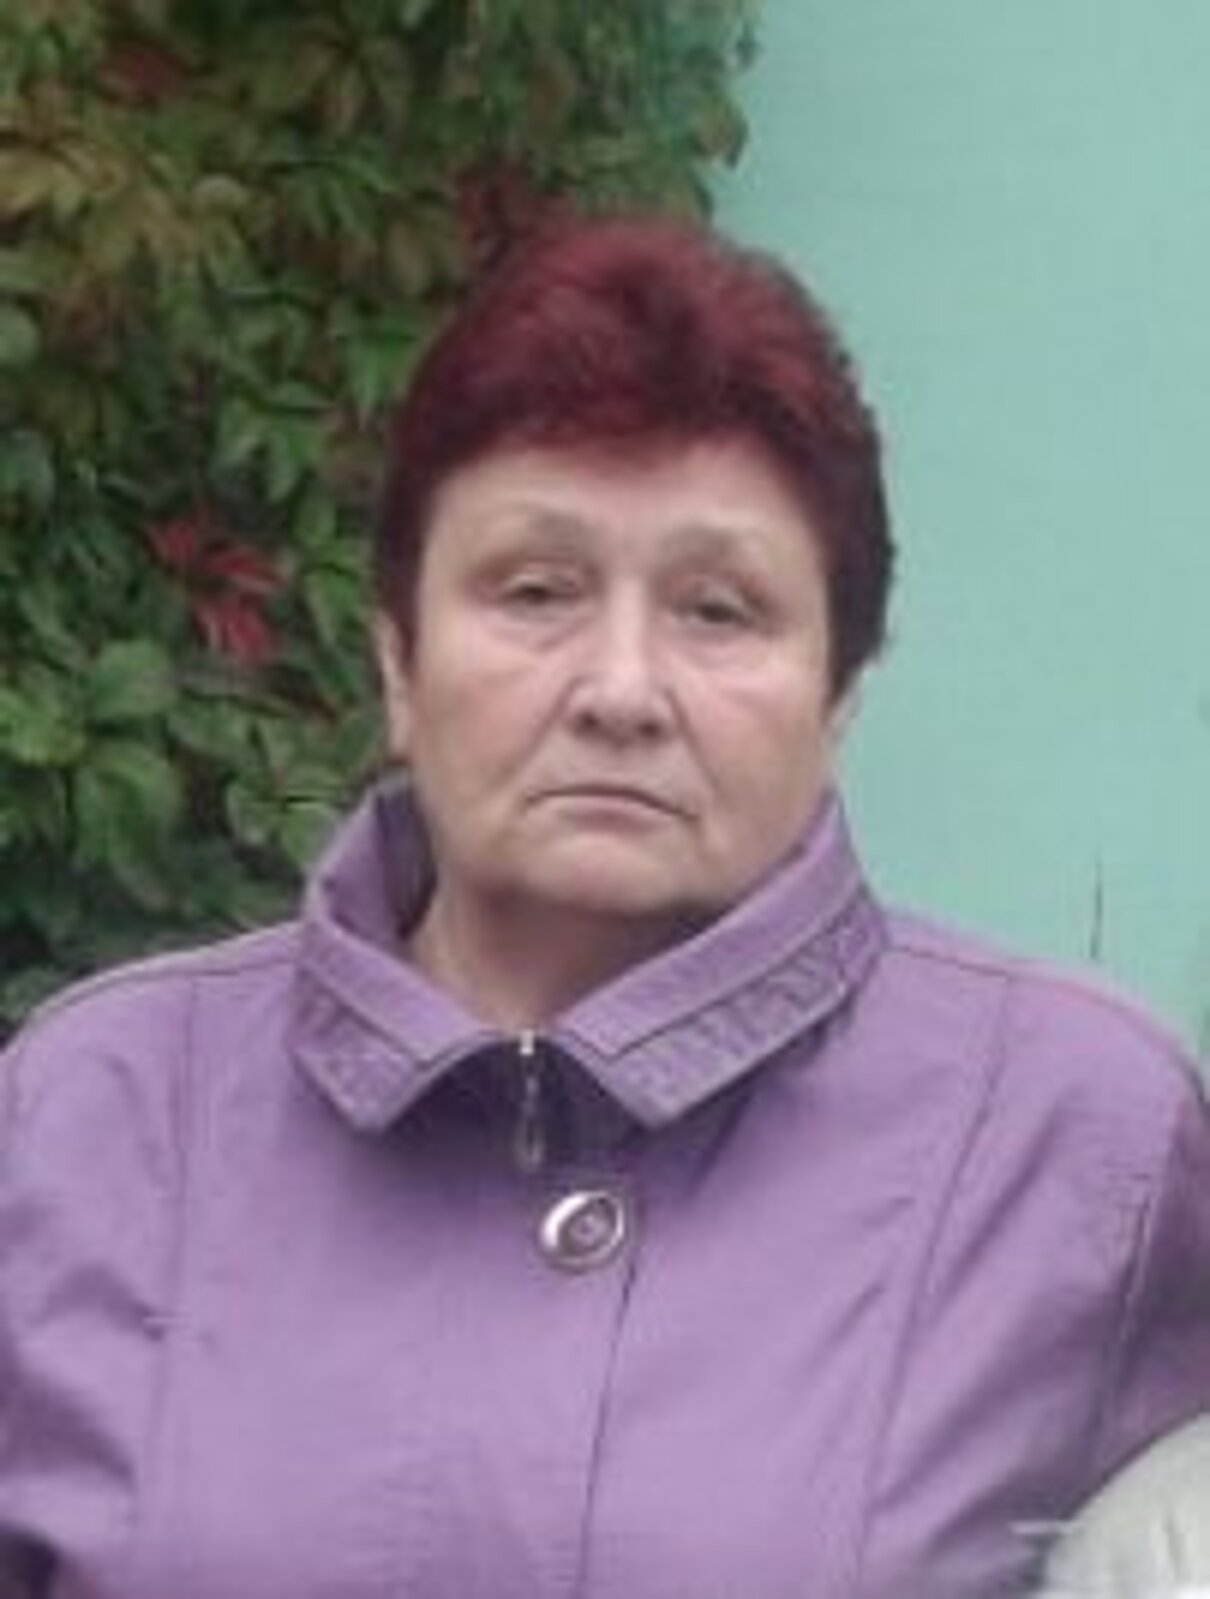 Жалоба-отзыв: Савенкова Зоя - Самогонщица.  Фото №3